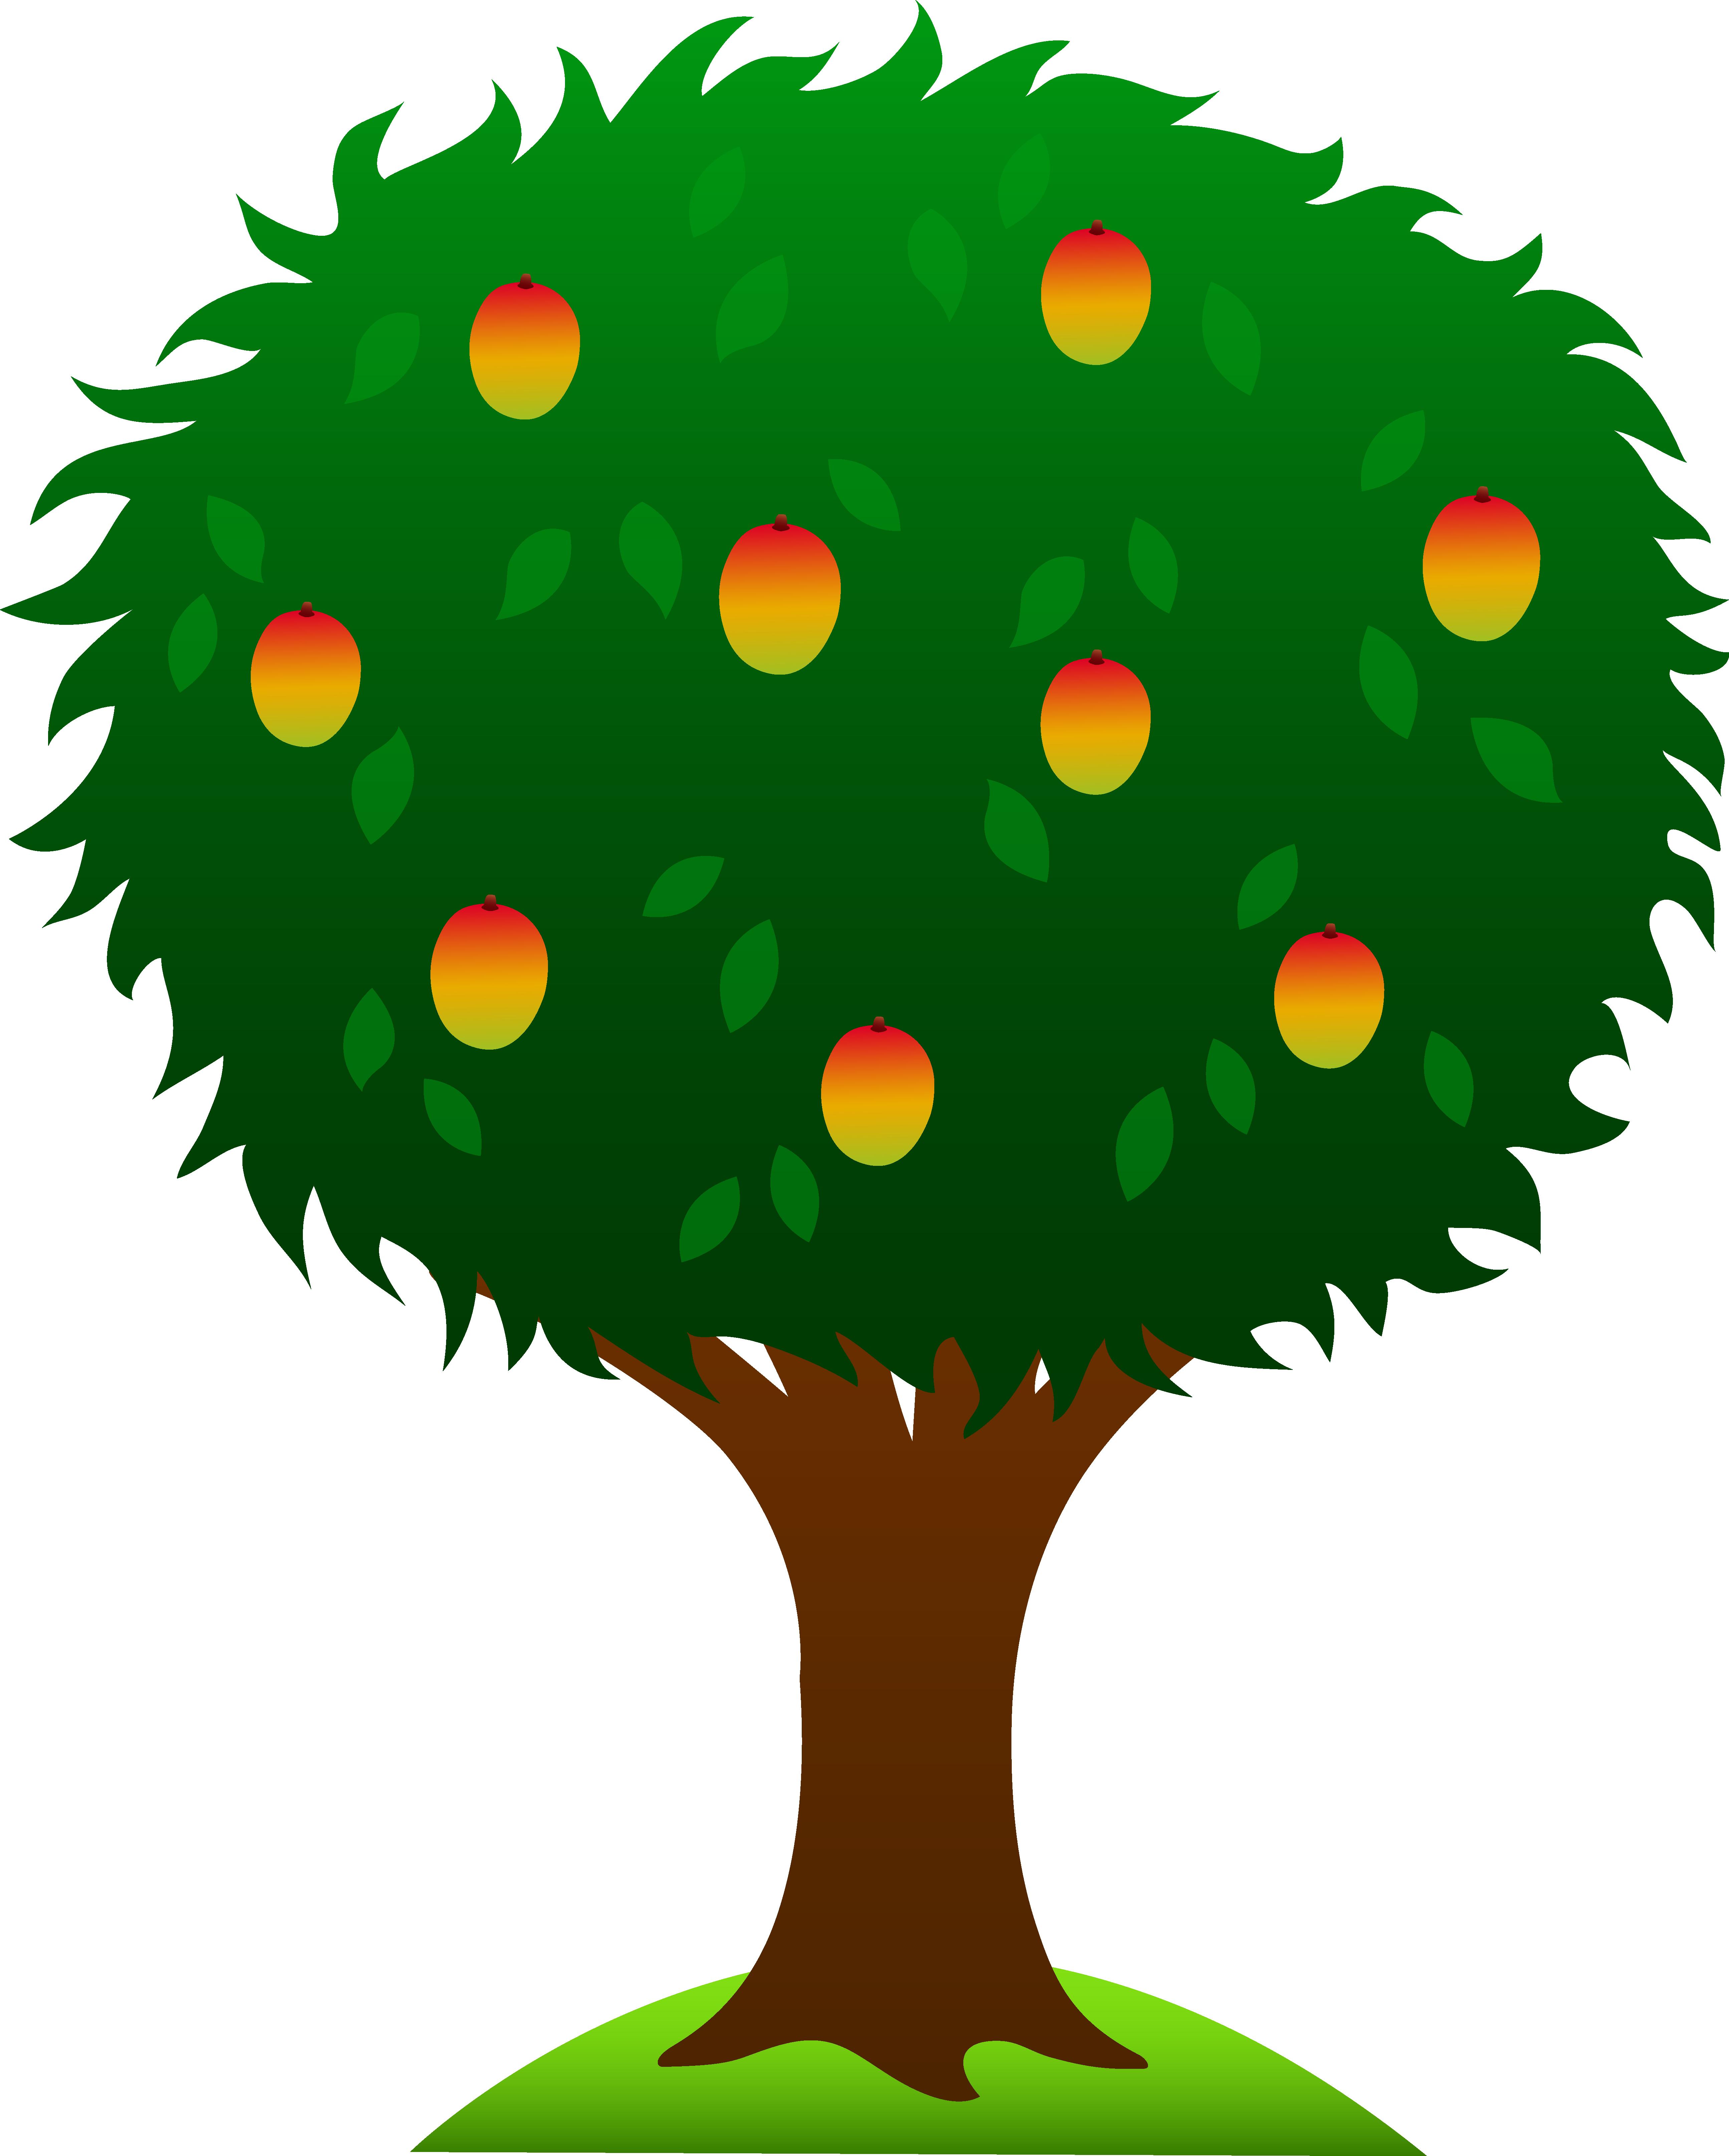 Mango Tree With Ripe Fruits Mango Tree Clip Art Transparent Cartoon Jing Fm Br4 c4d lwo max ma lxo vue 3ds obj. jing fm